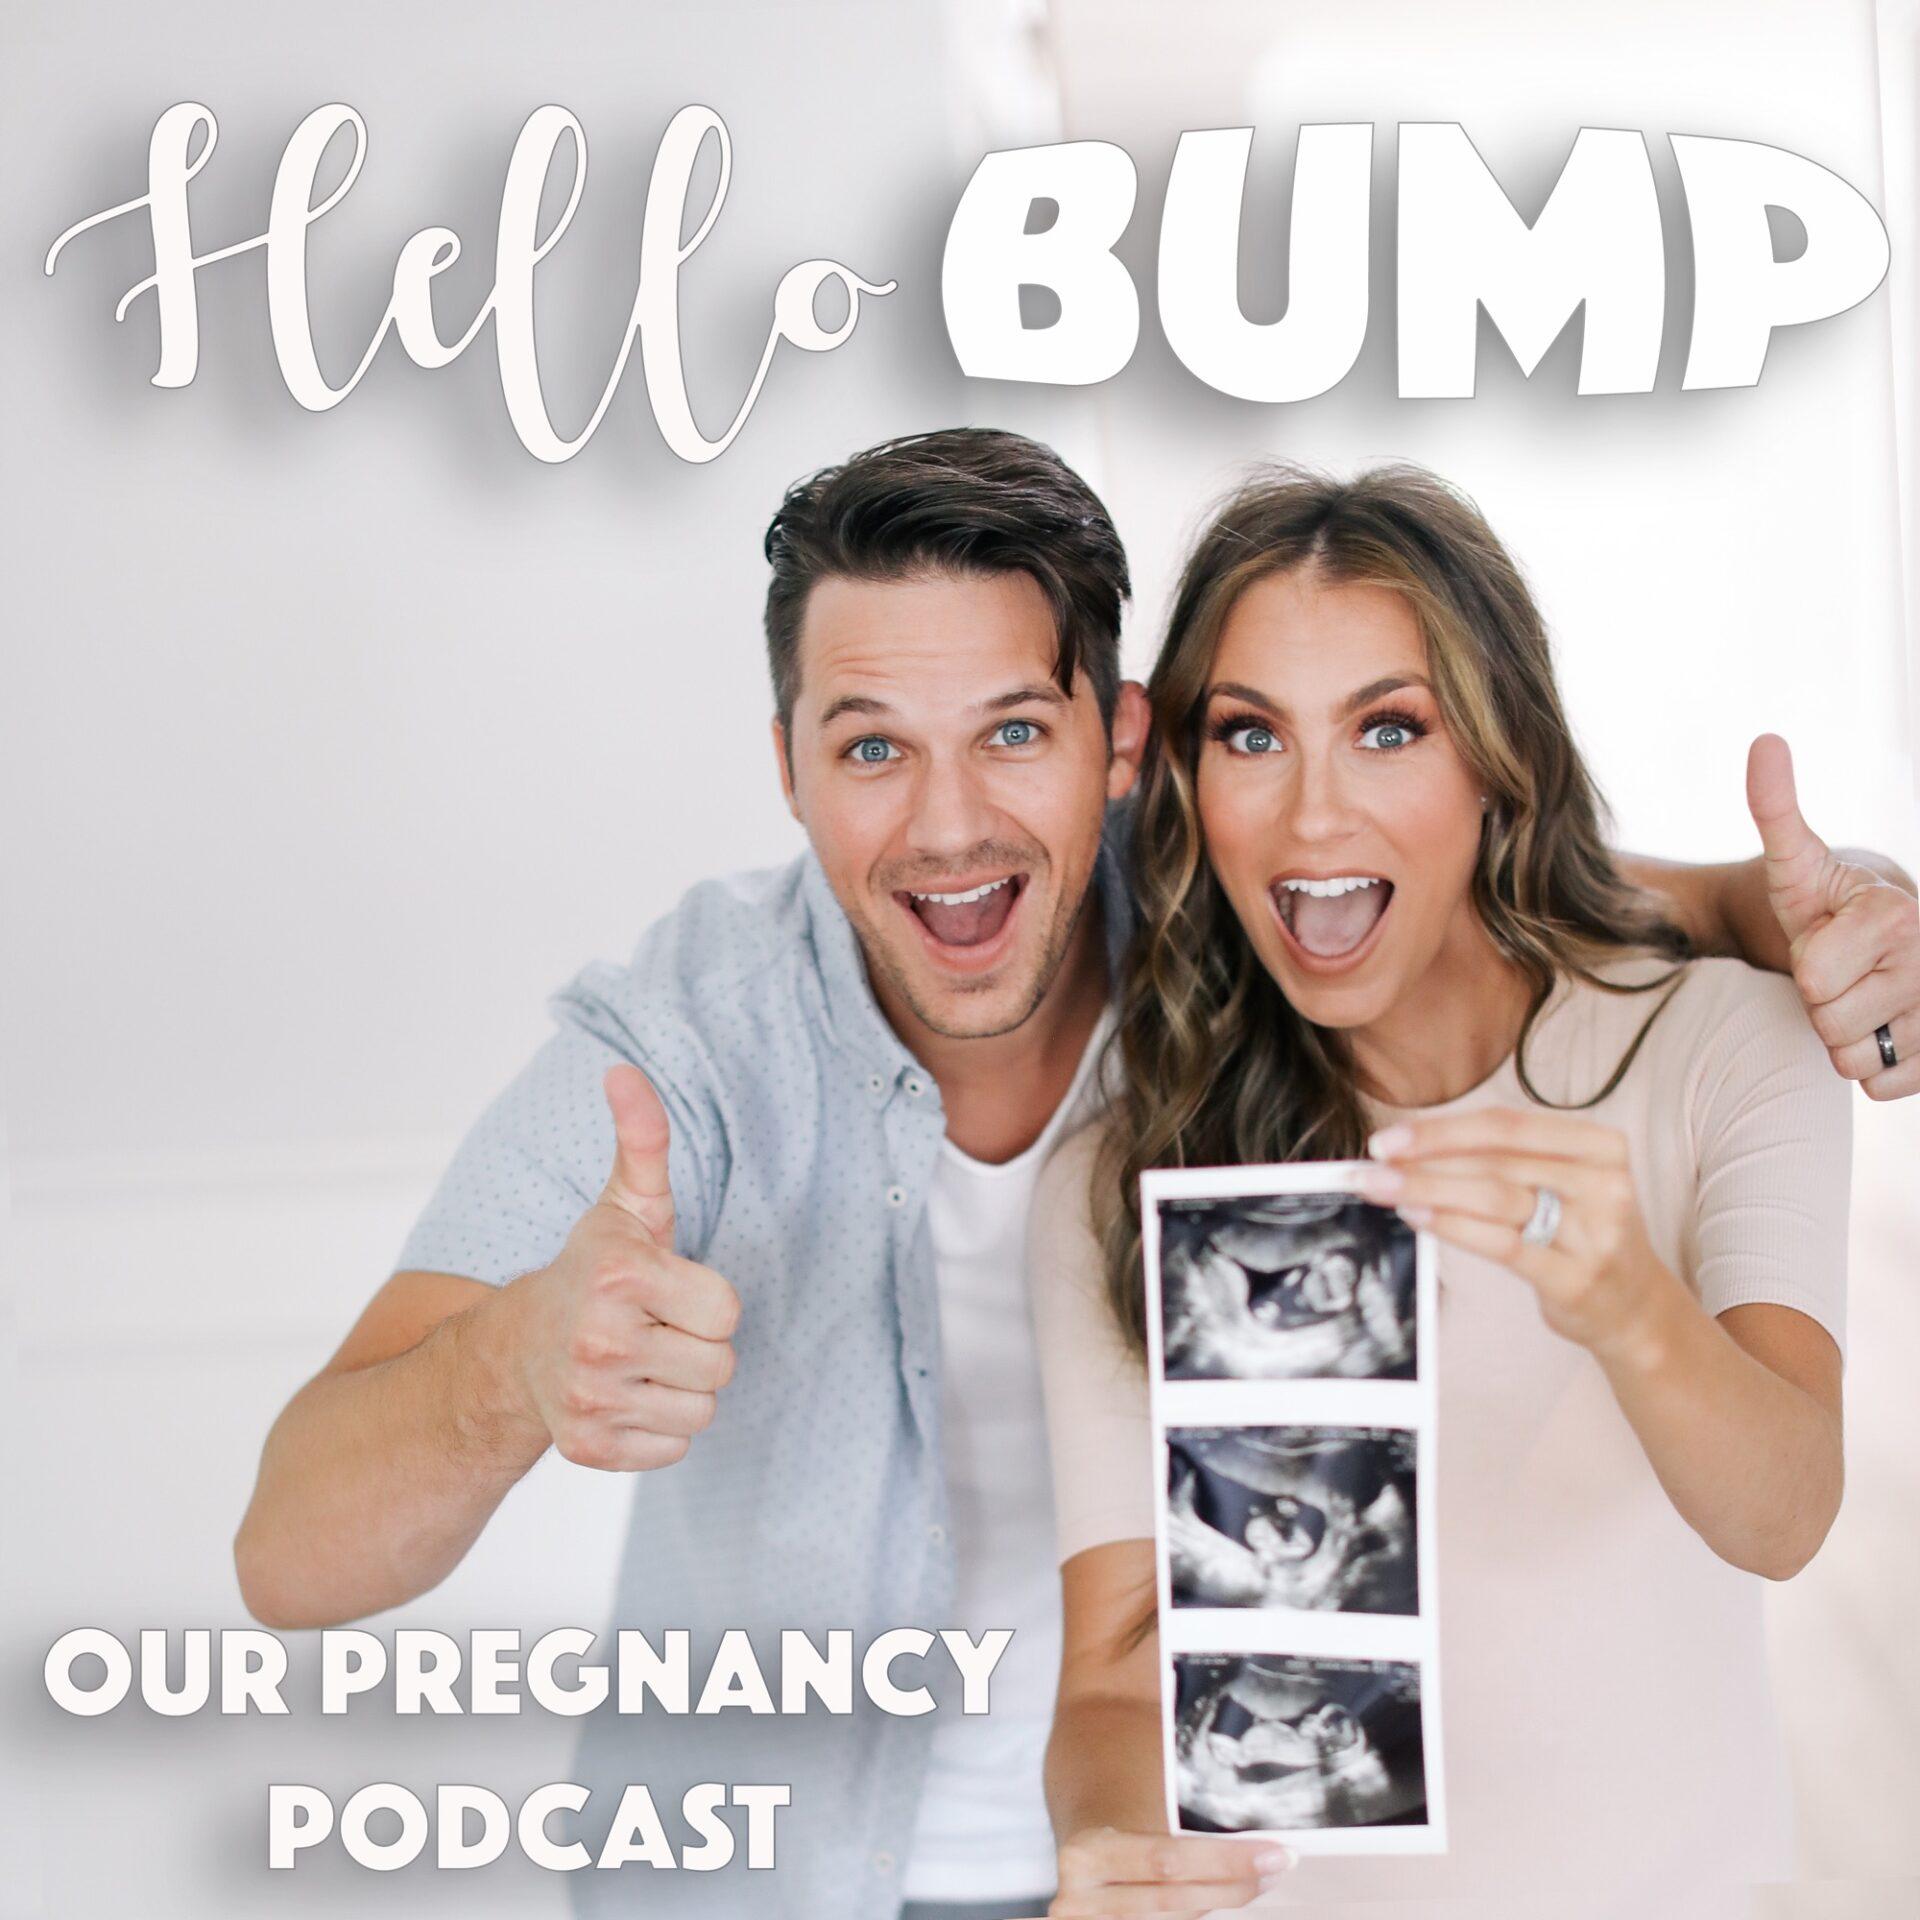 Hello Bump Podcast Episodes 6 & 7 Cyst Recap